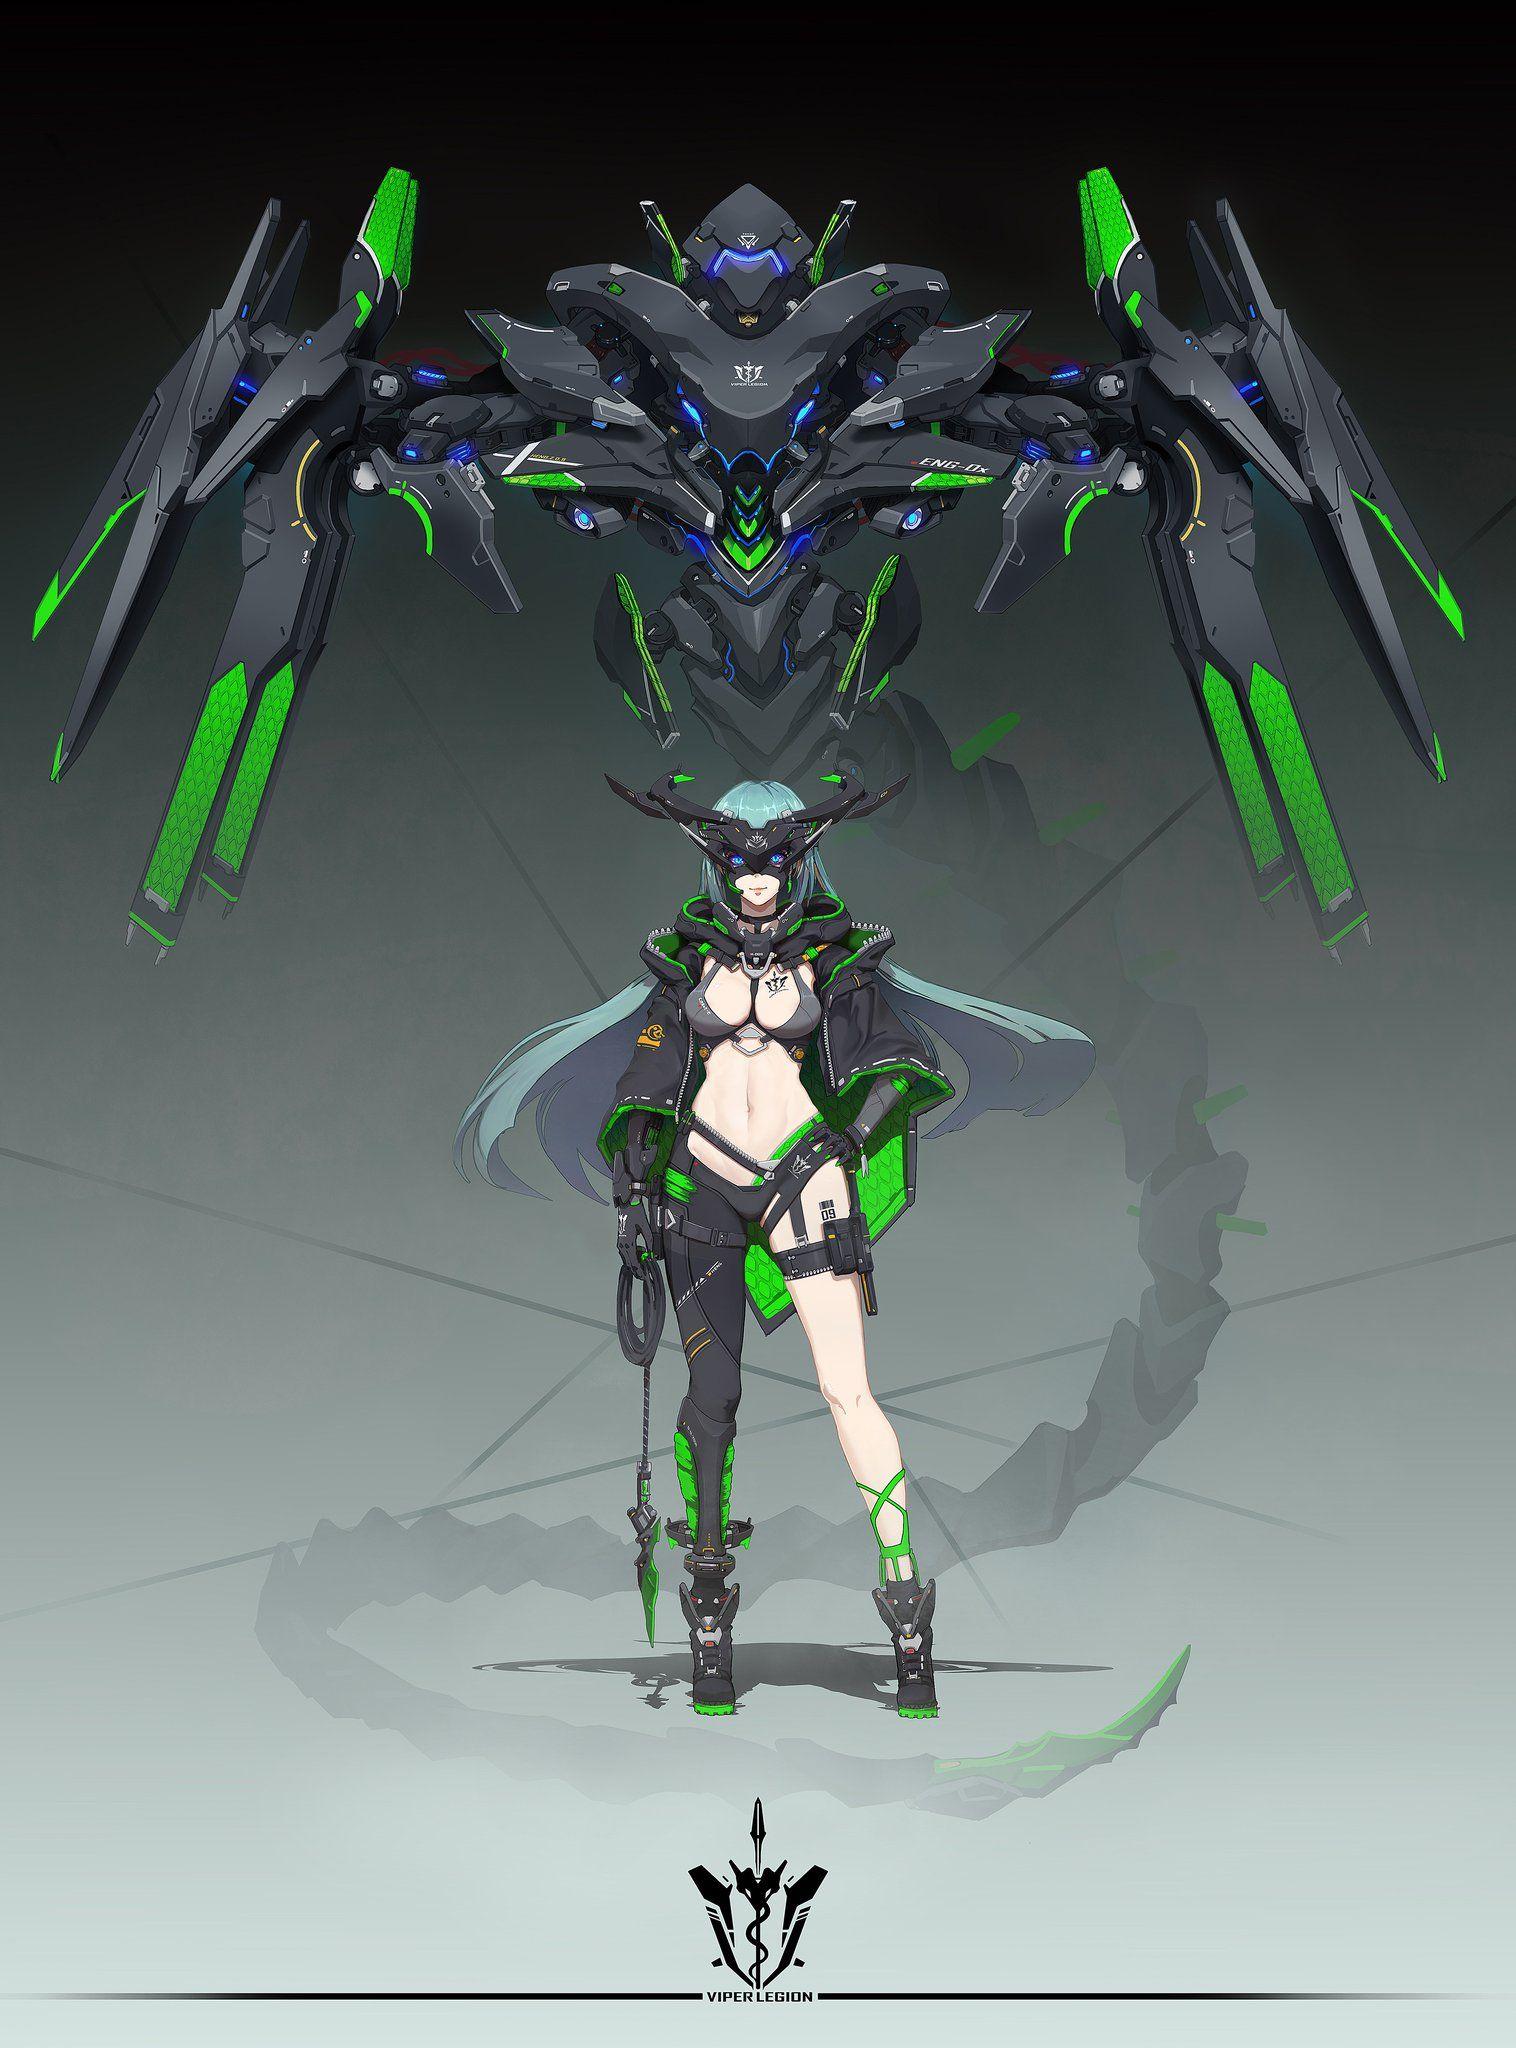 HENG Z on Robot concept art, Fantasy character design